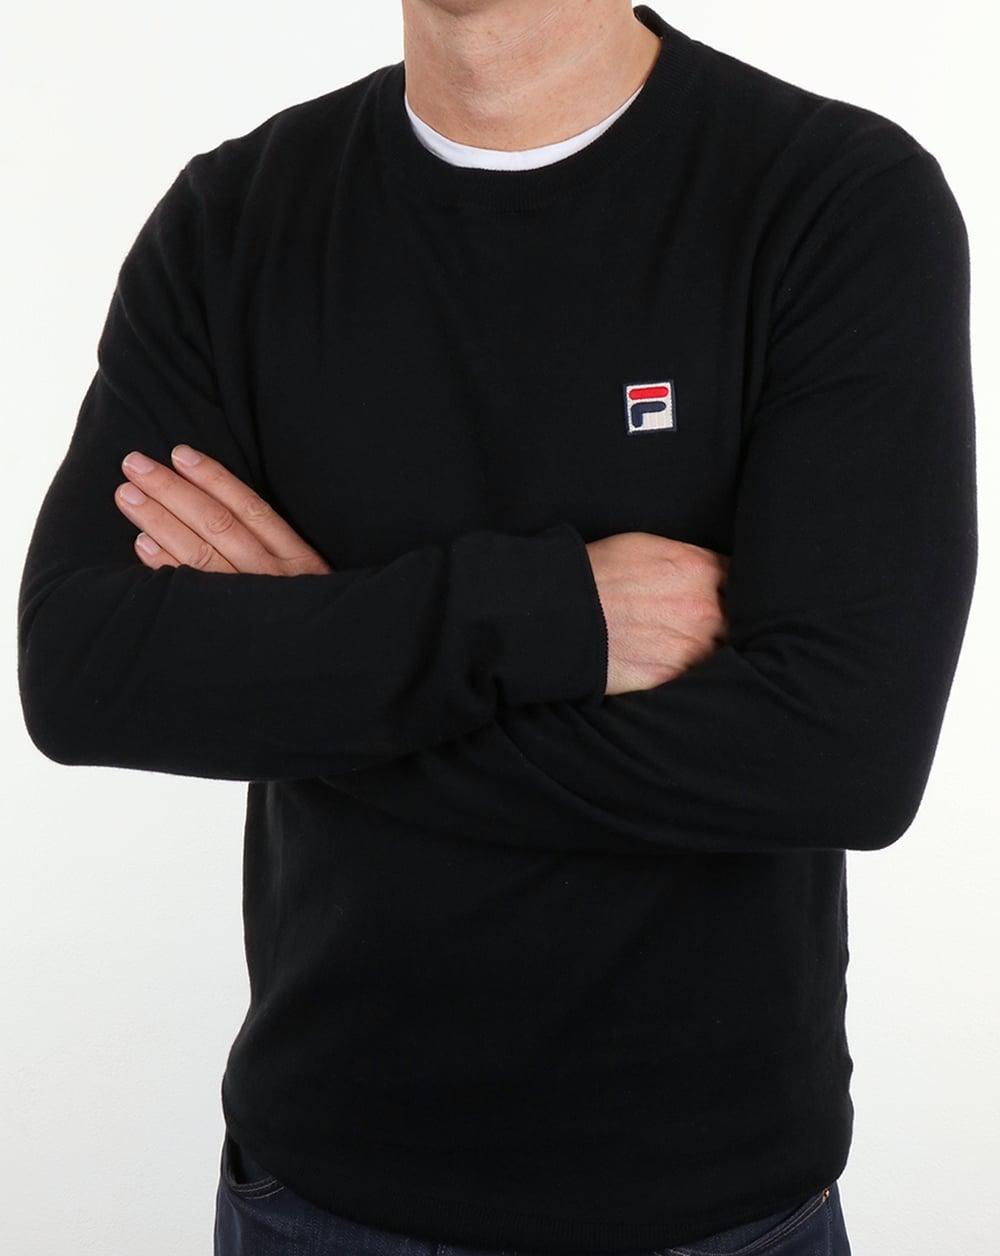 e8d25959215 Fila Vintage Sala Crew Neck Jumper Black,round,cotton,sweater,mens